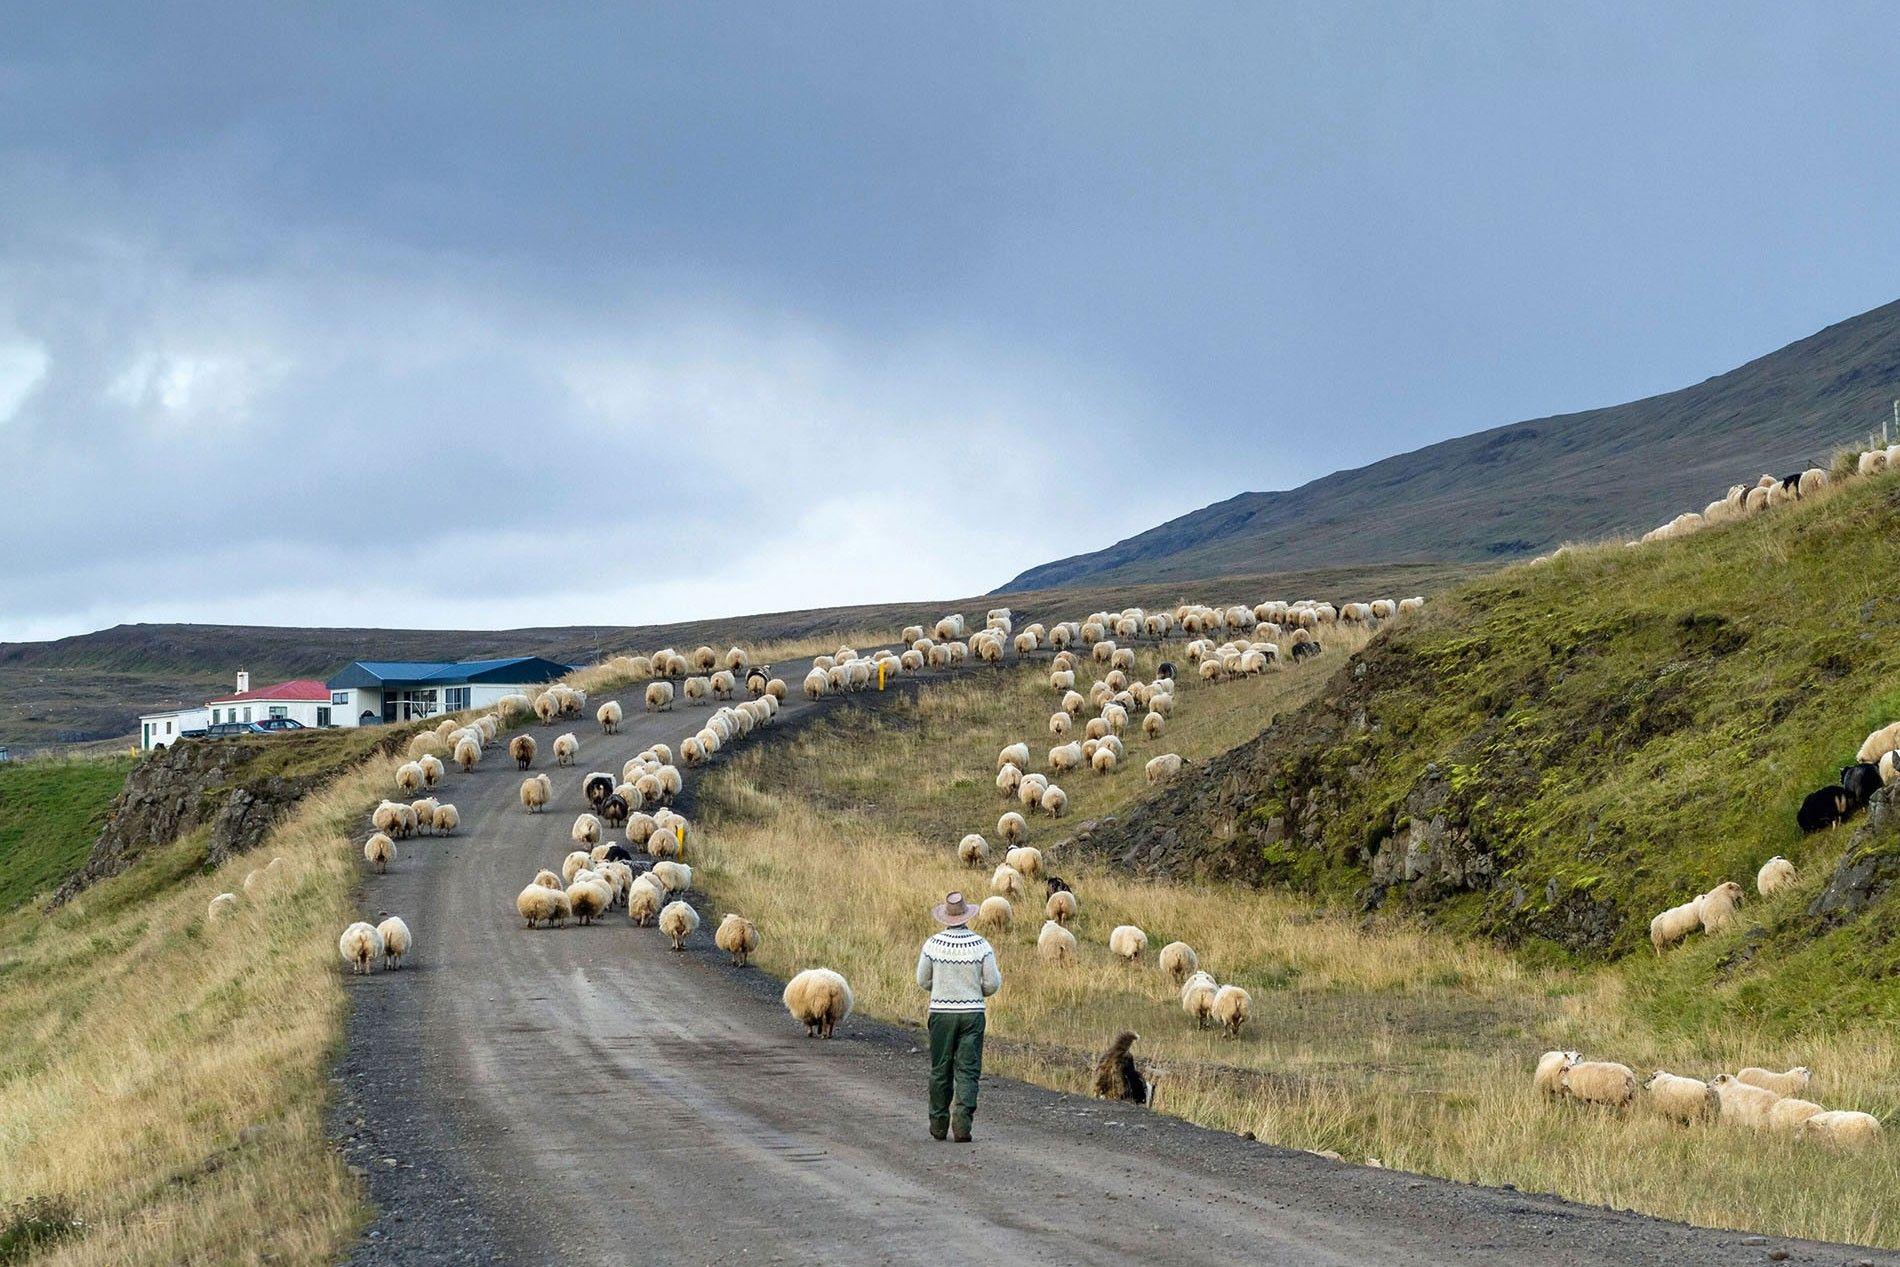 A shepherd herds his sheep down a dirt road in Vatnsnes Peninsula.